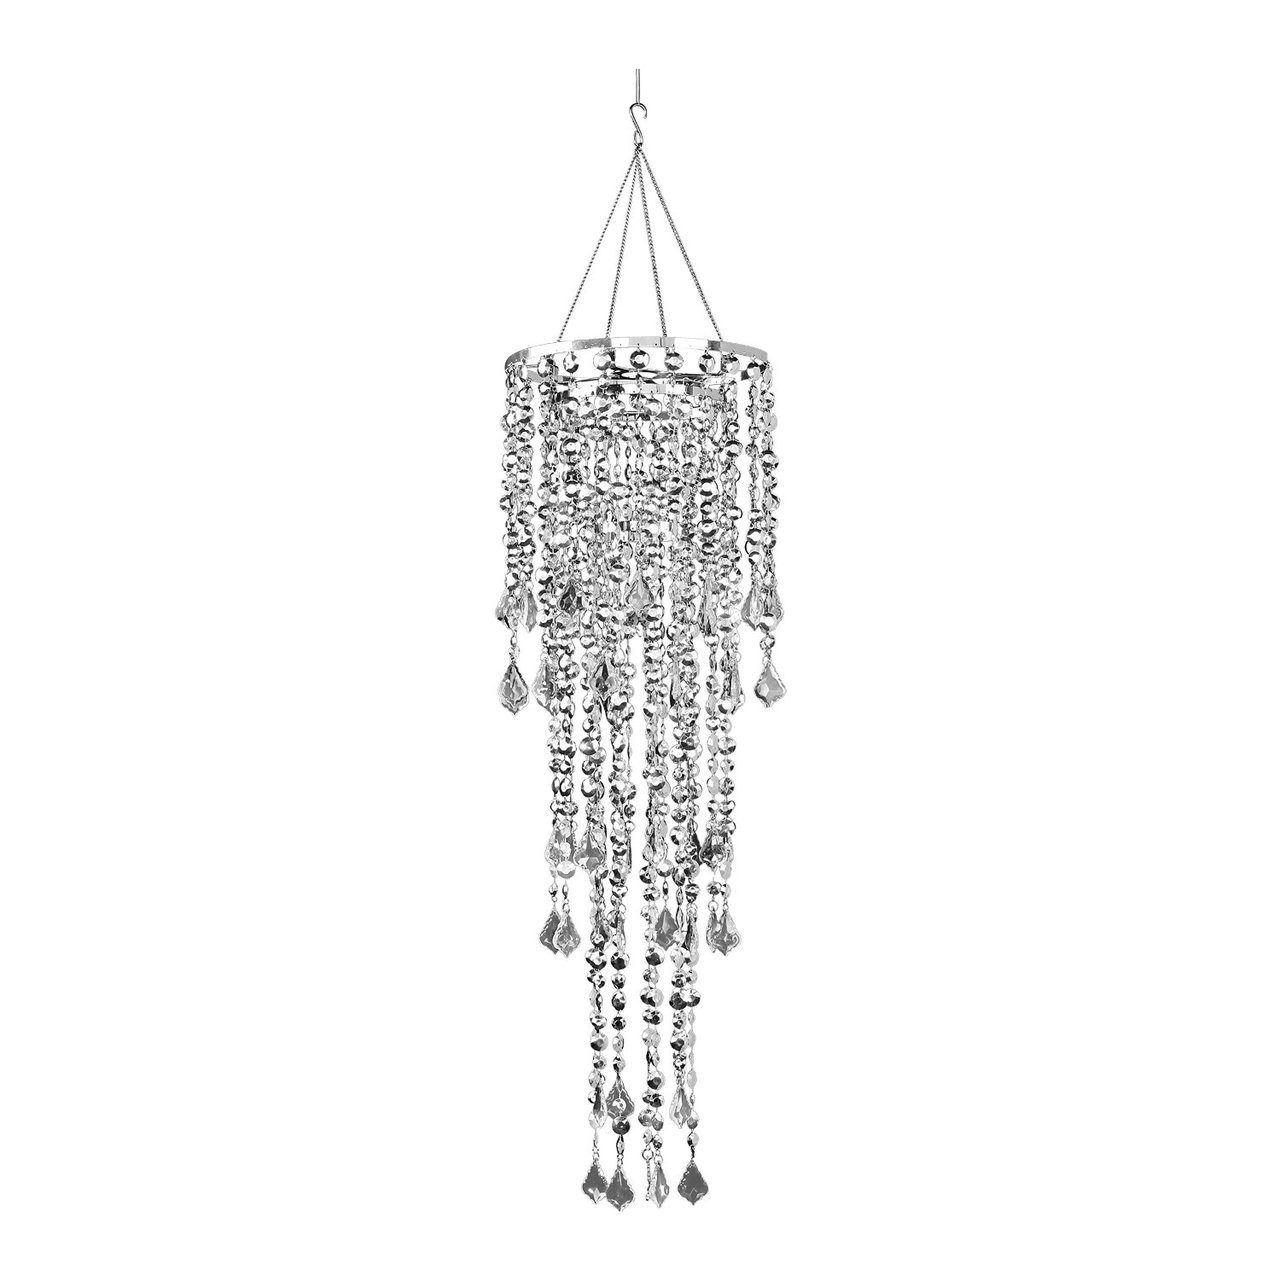 10 diameter multi diamond cut silver chandelier events wholesale loading zoom aloadofball Choice Image